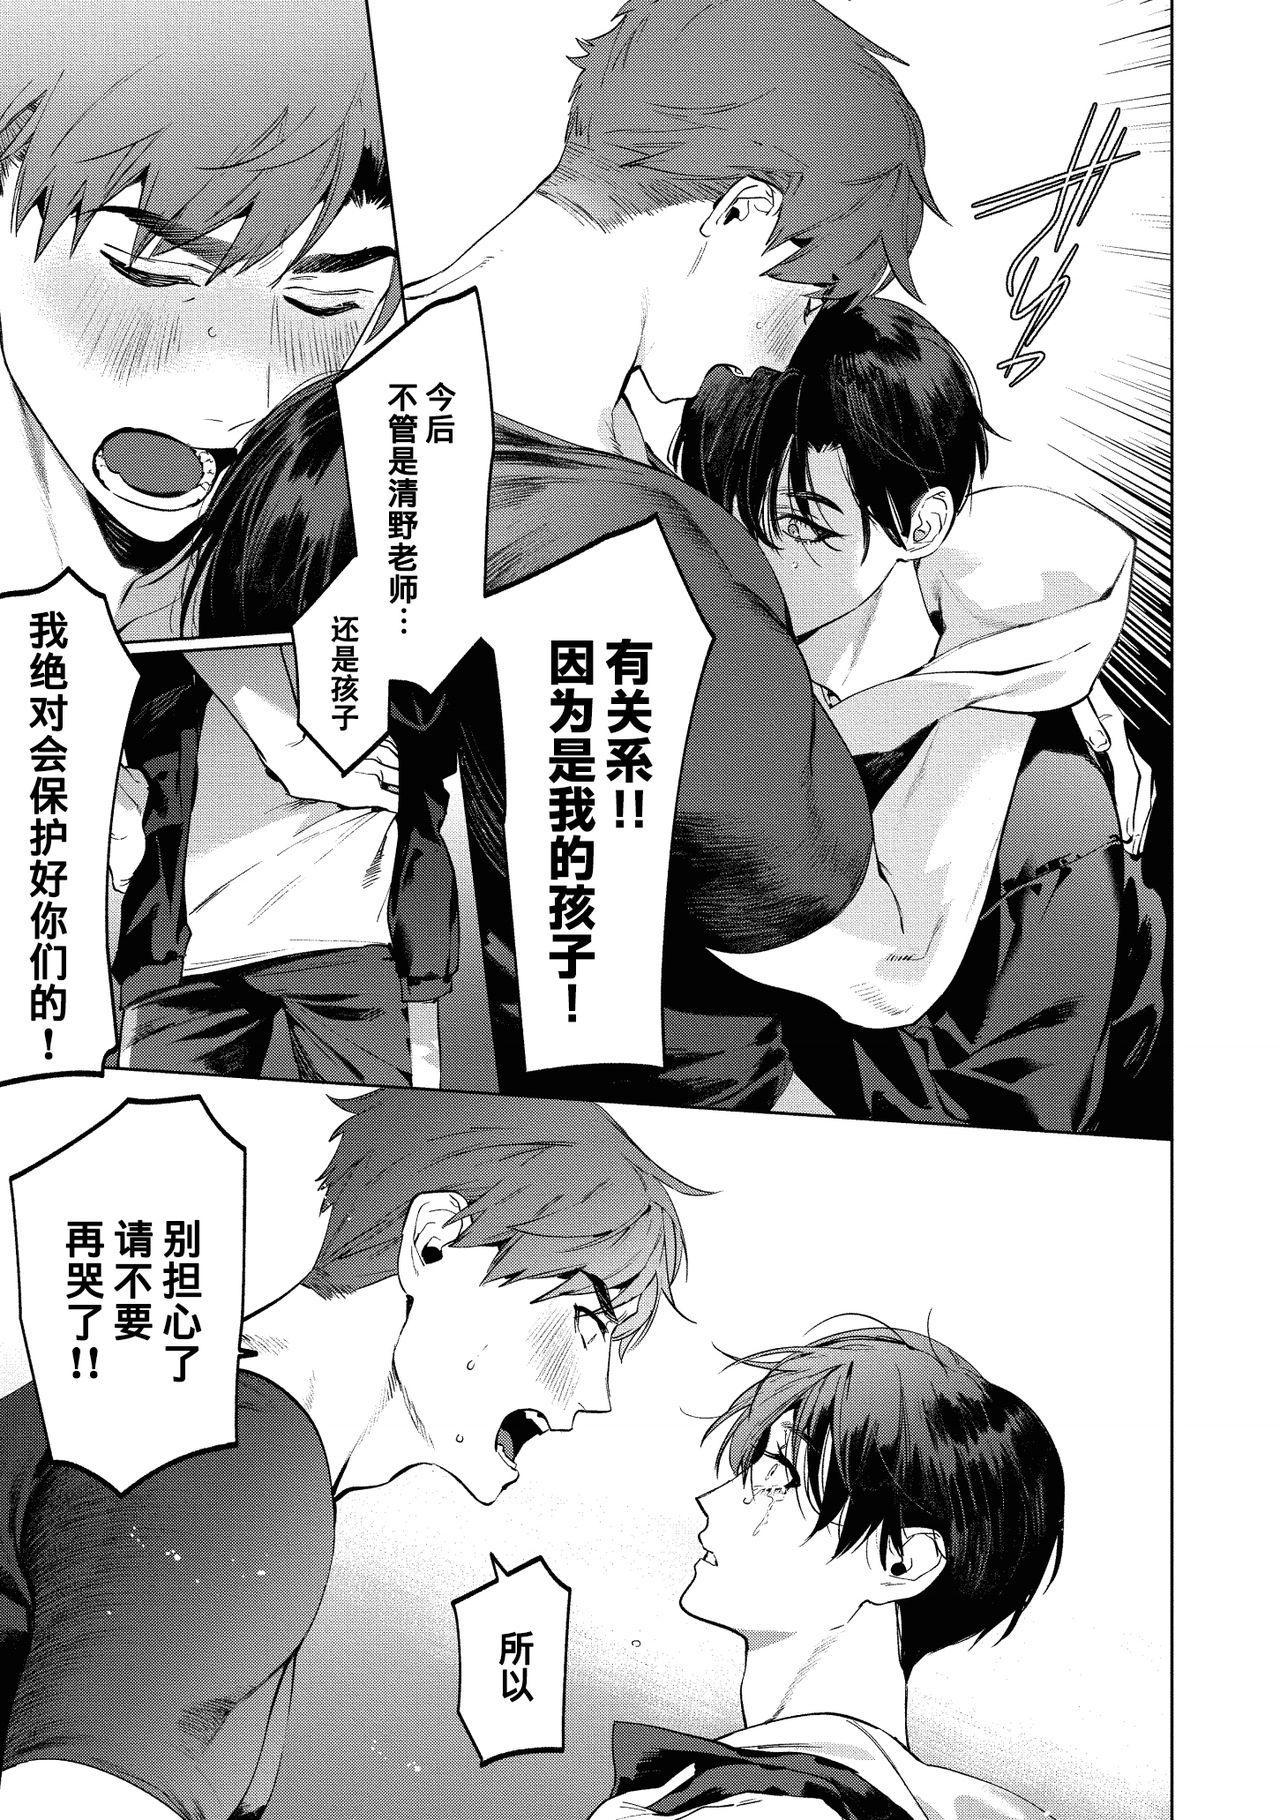 Sensei wa Benki ja Arimasen.3 | 老师不是便器。3 22